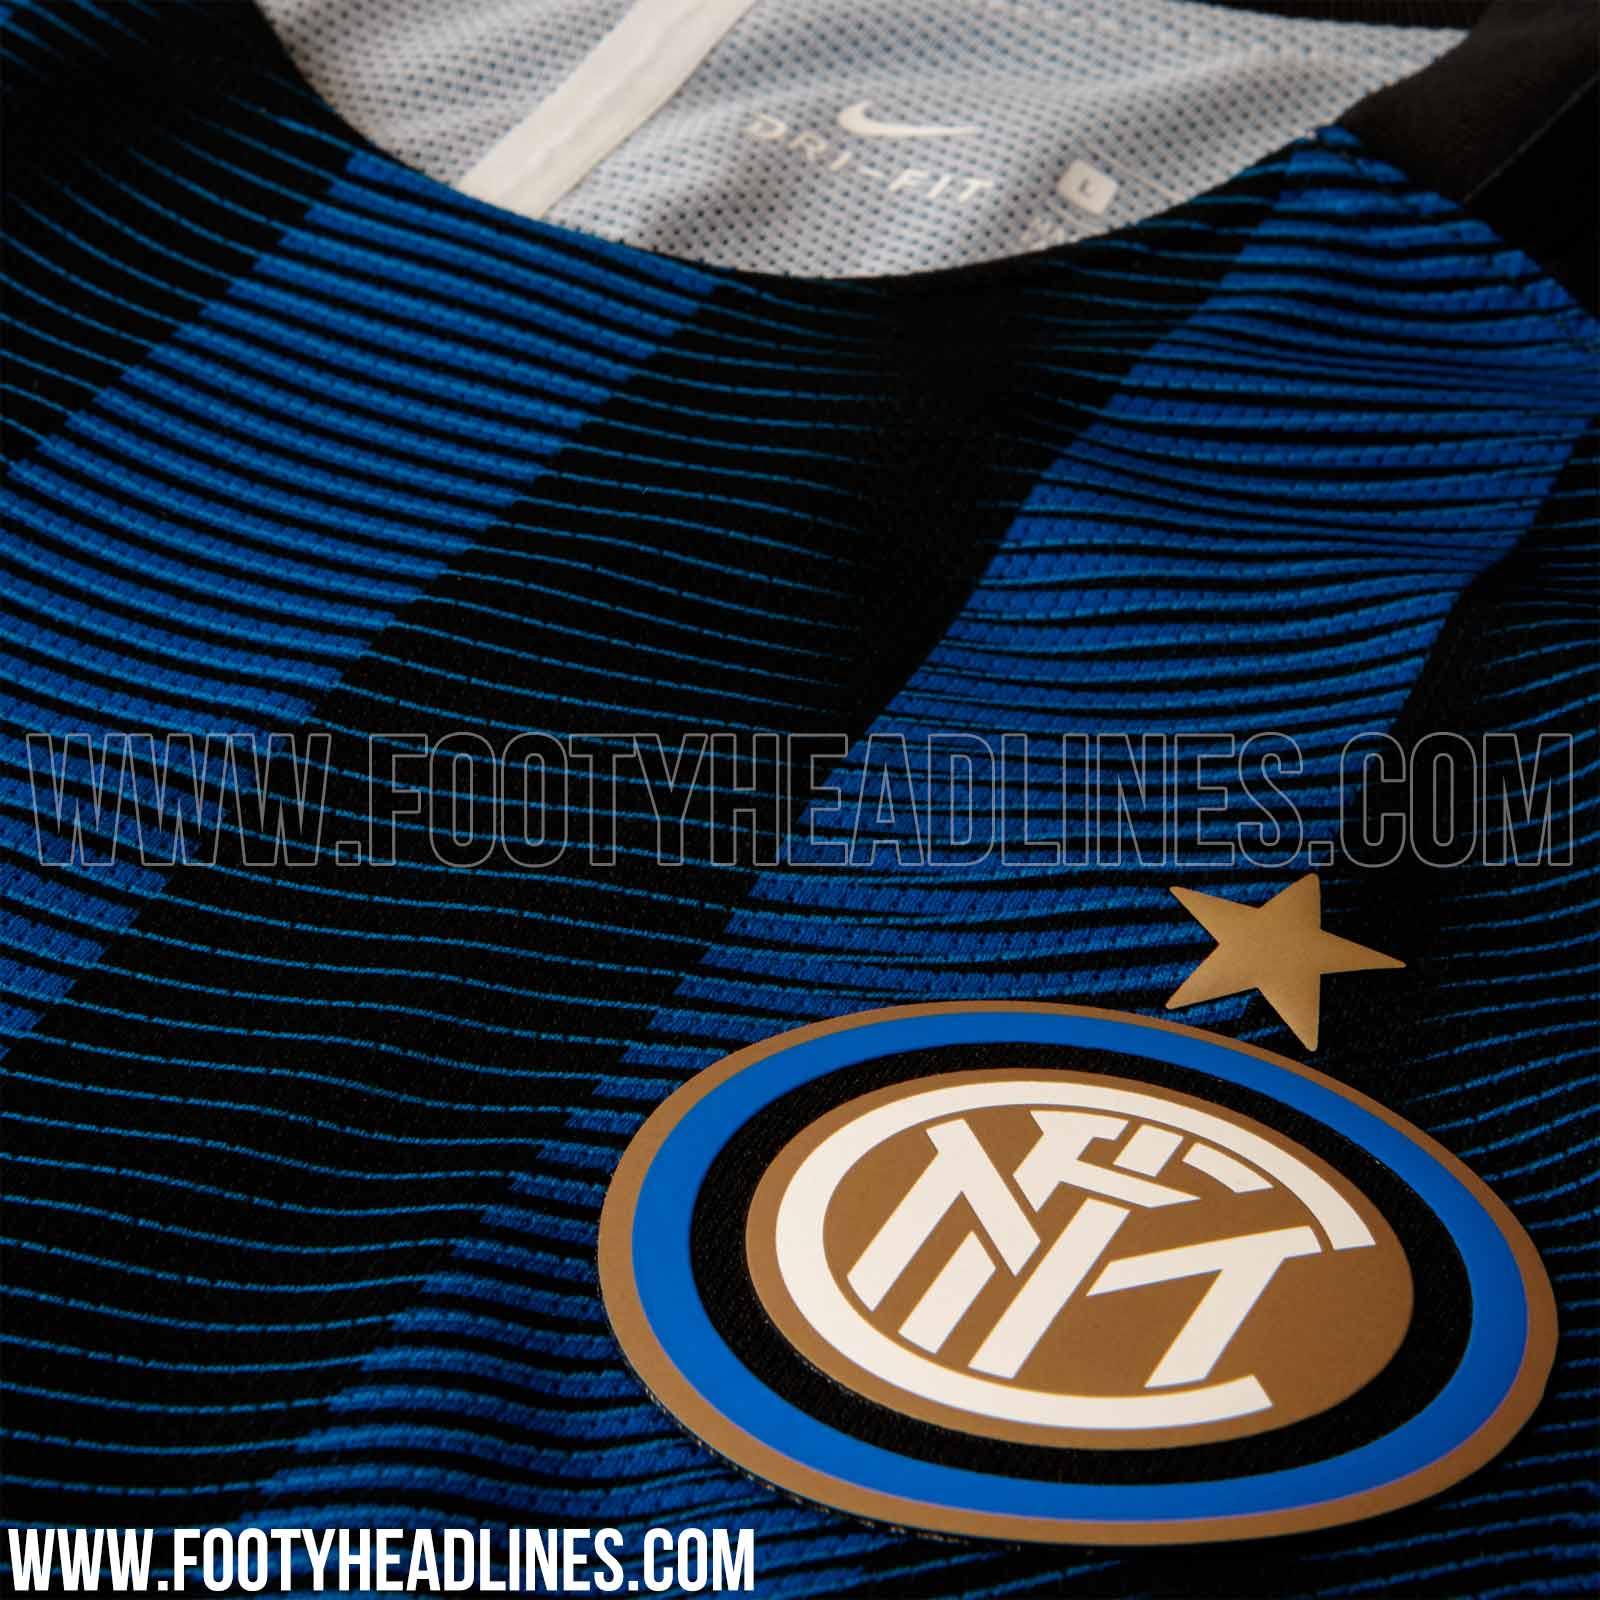 Maillot domicile Inter Milan 2016-17